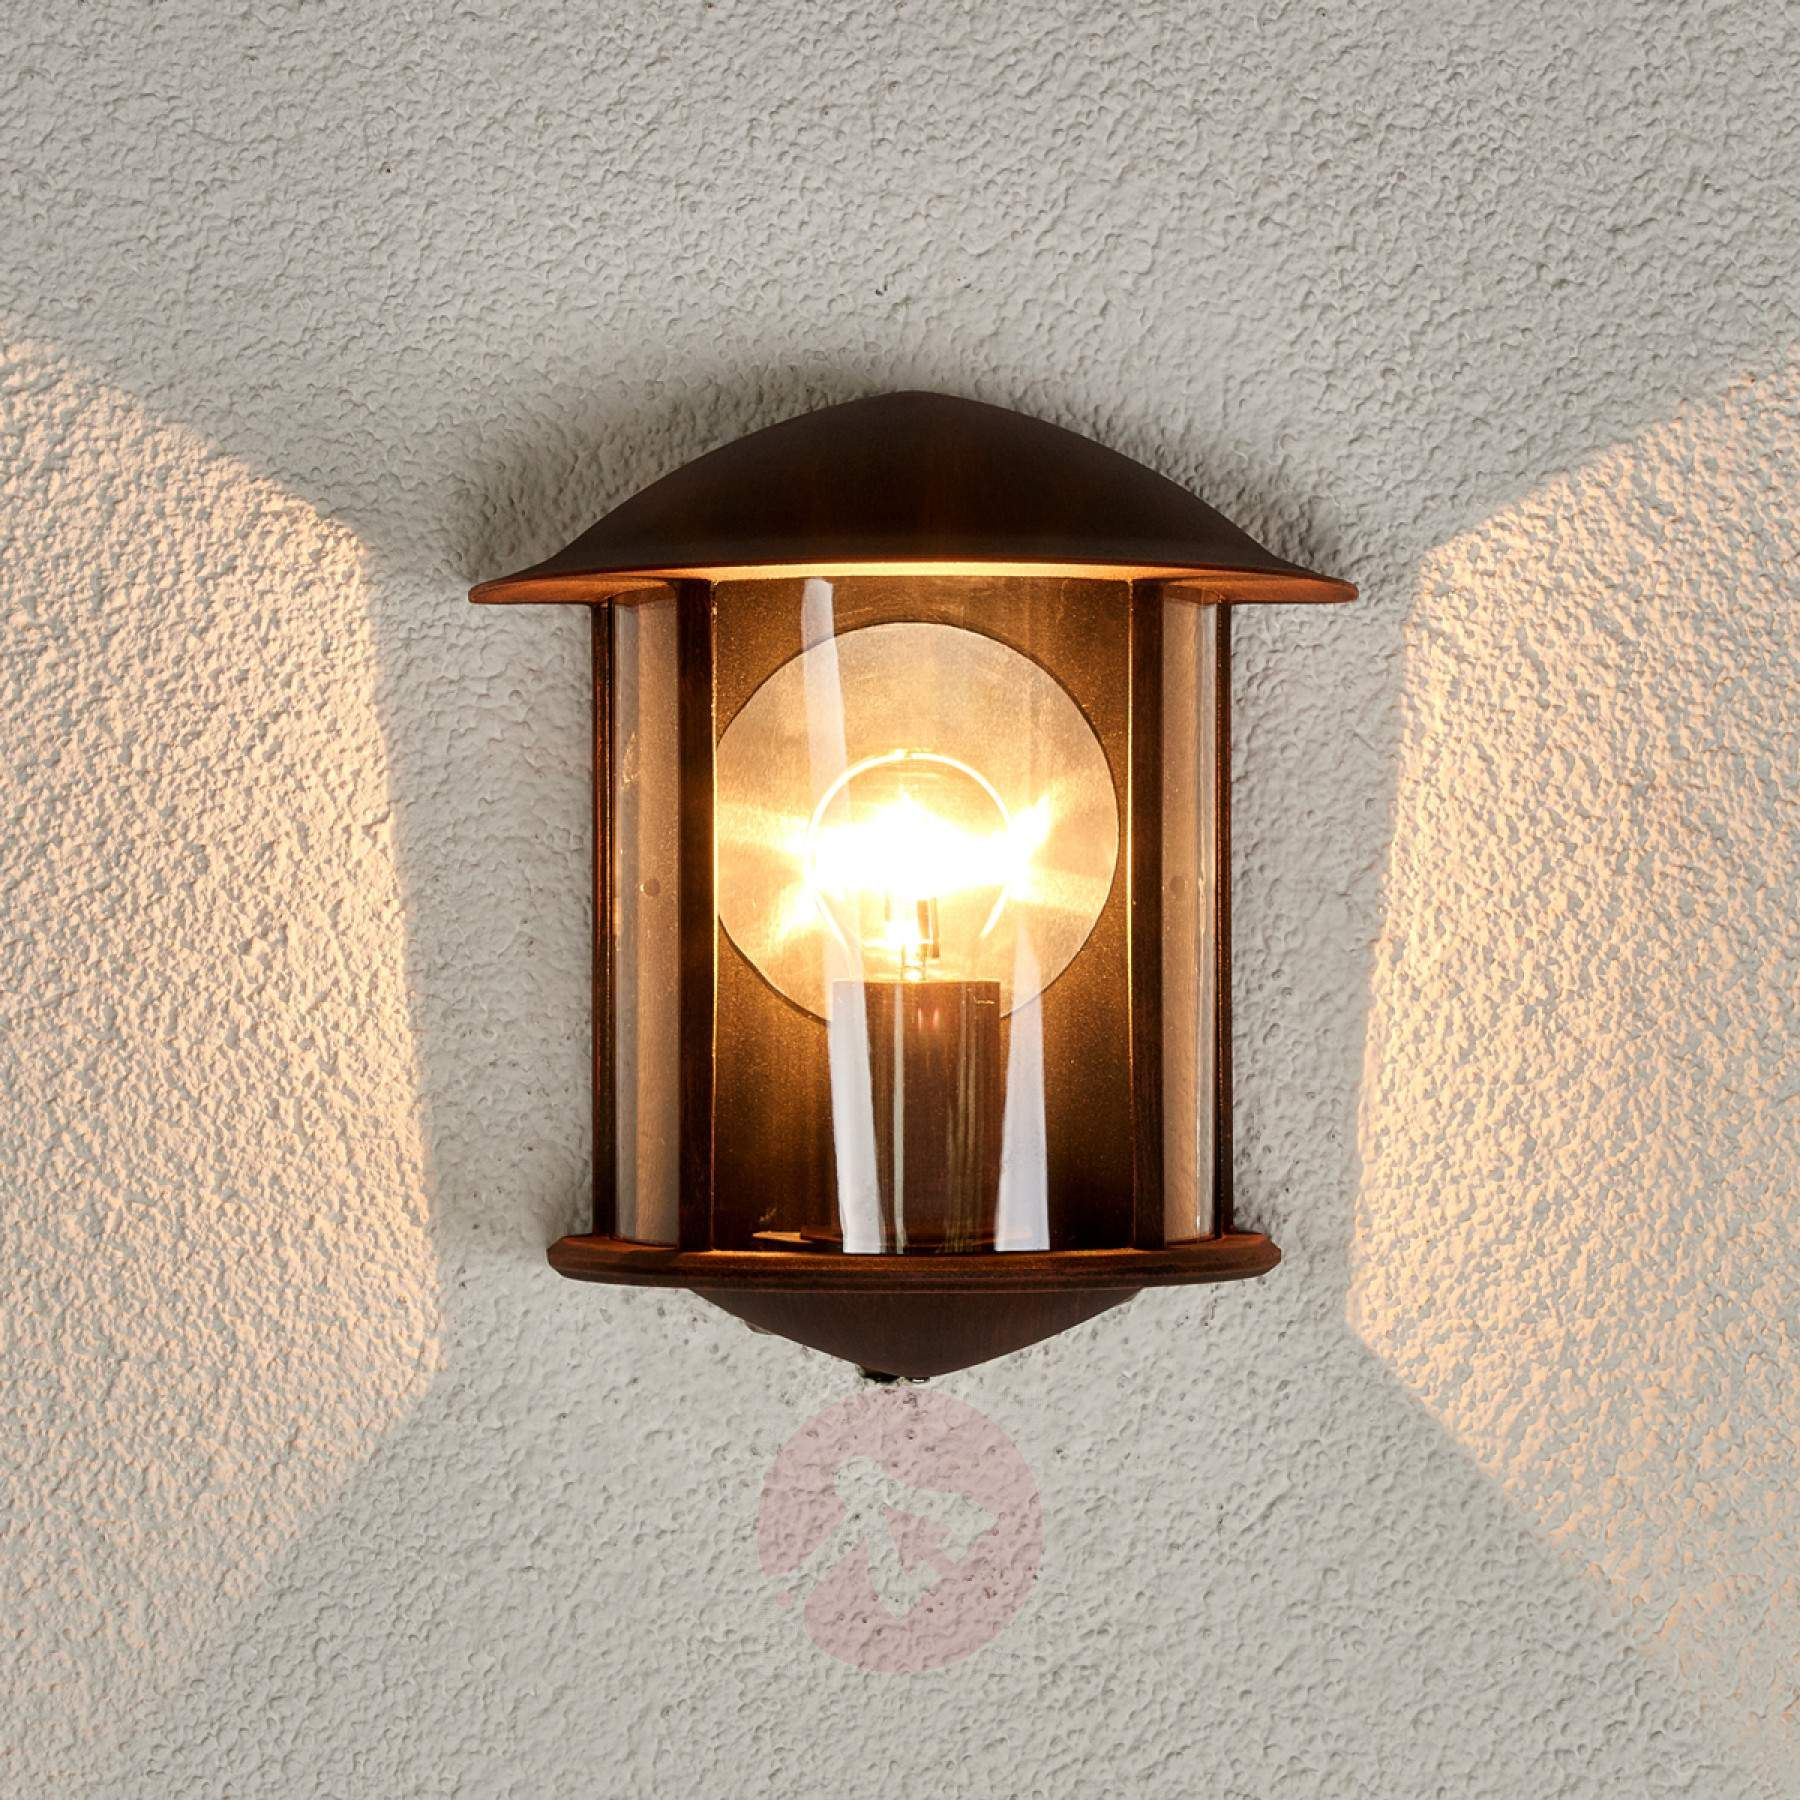 Maelis Led Outside Wall Light Rust Brown Wall Lights Exterior Wall Light Wall